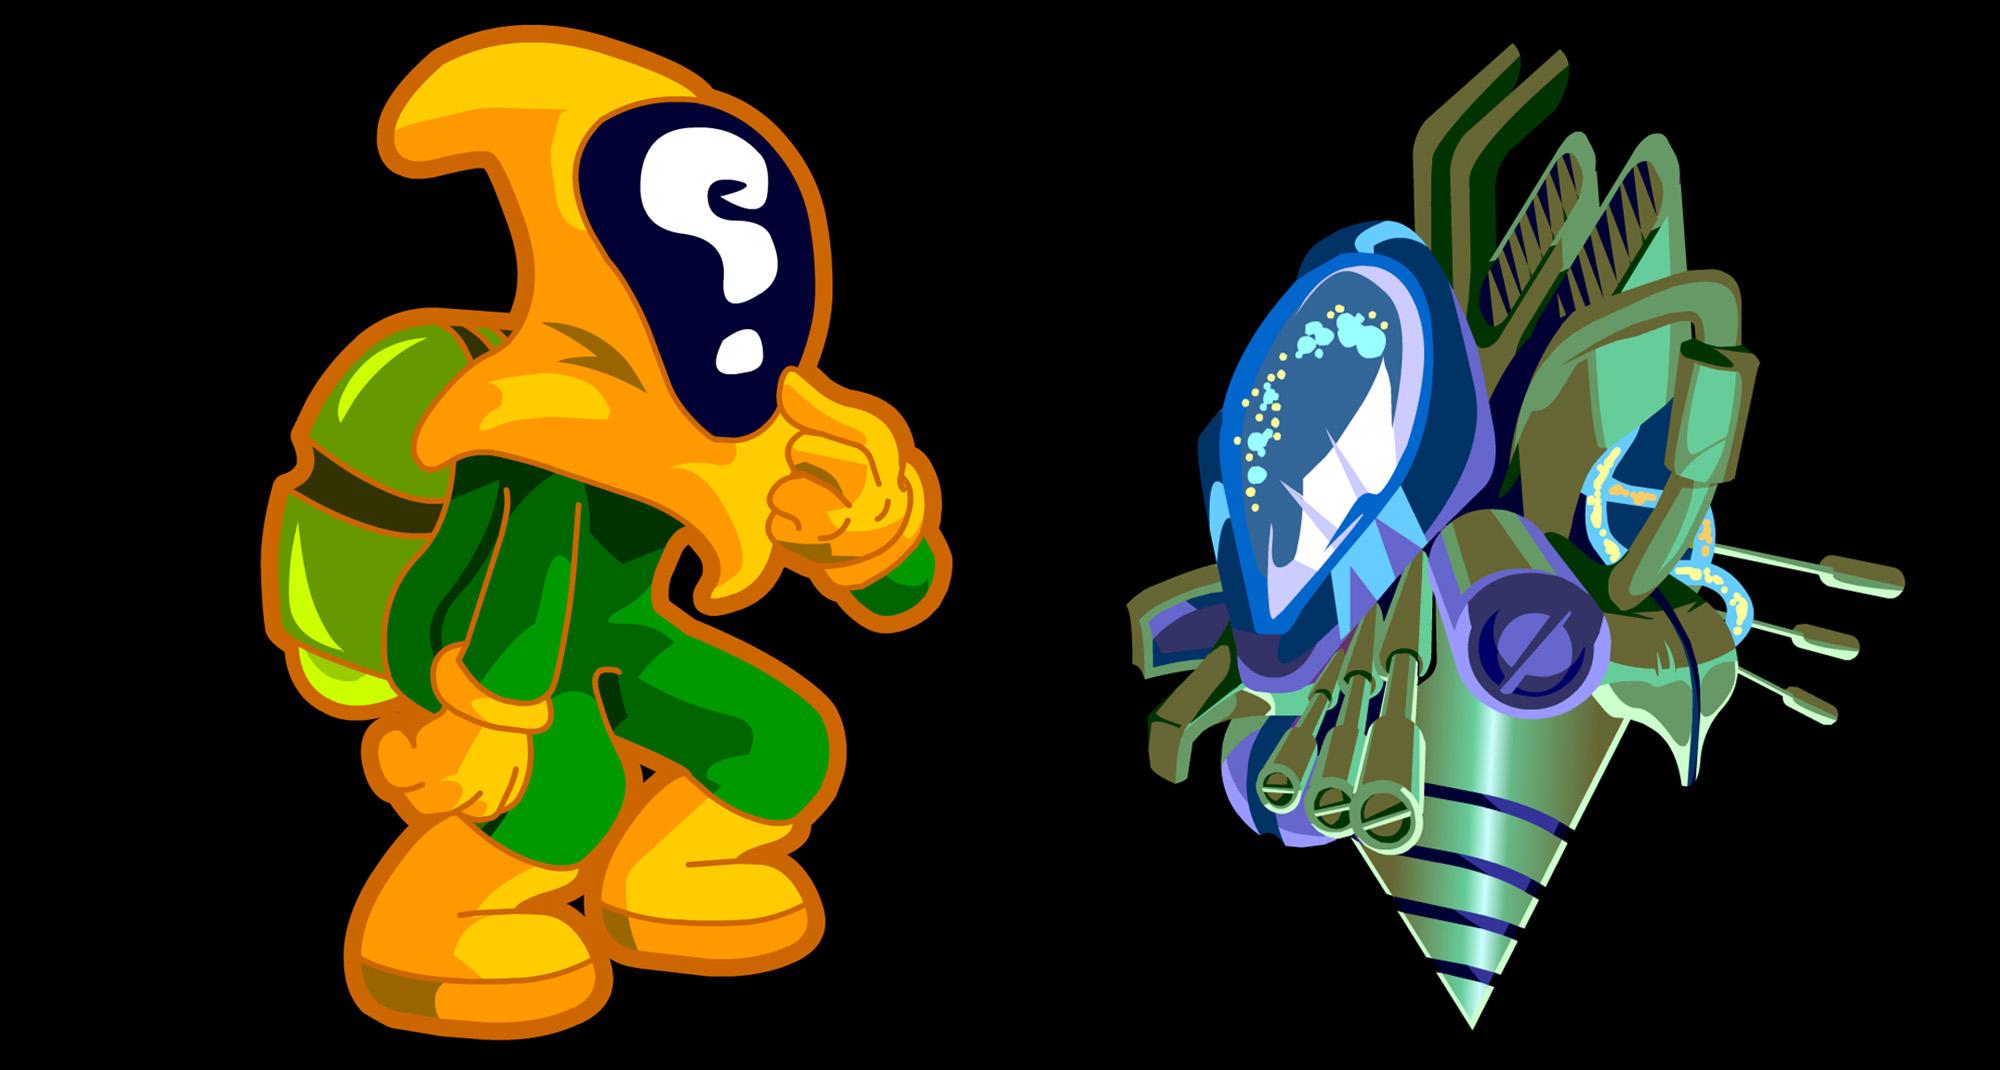 ceo-aliens5.jpg